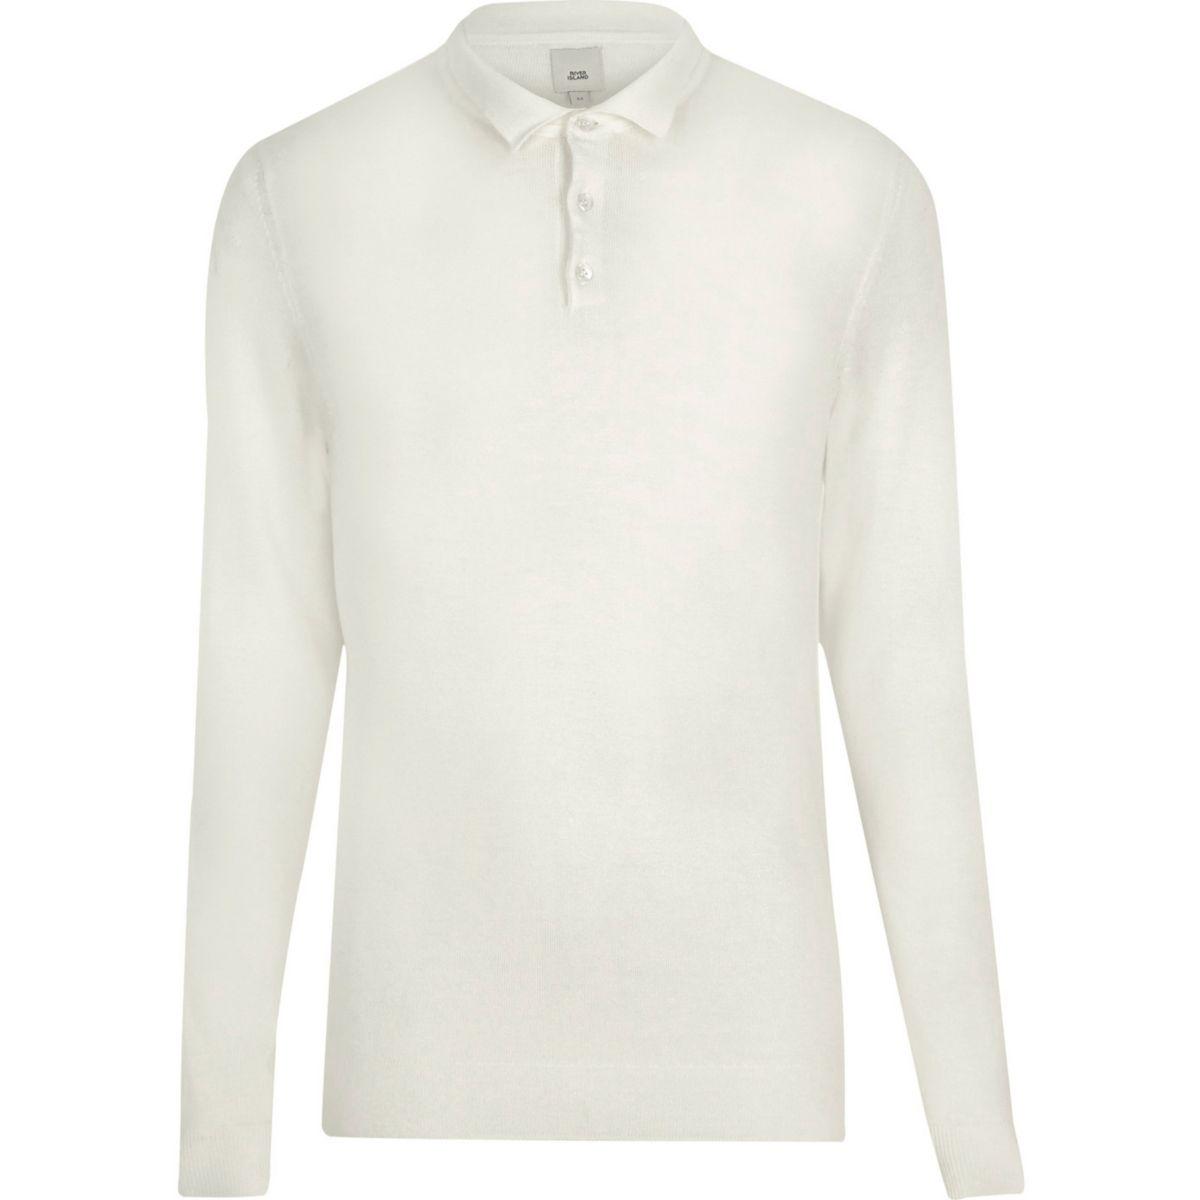 Cream long sleeve knit polo shirt